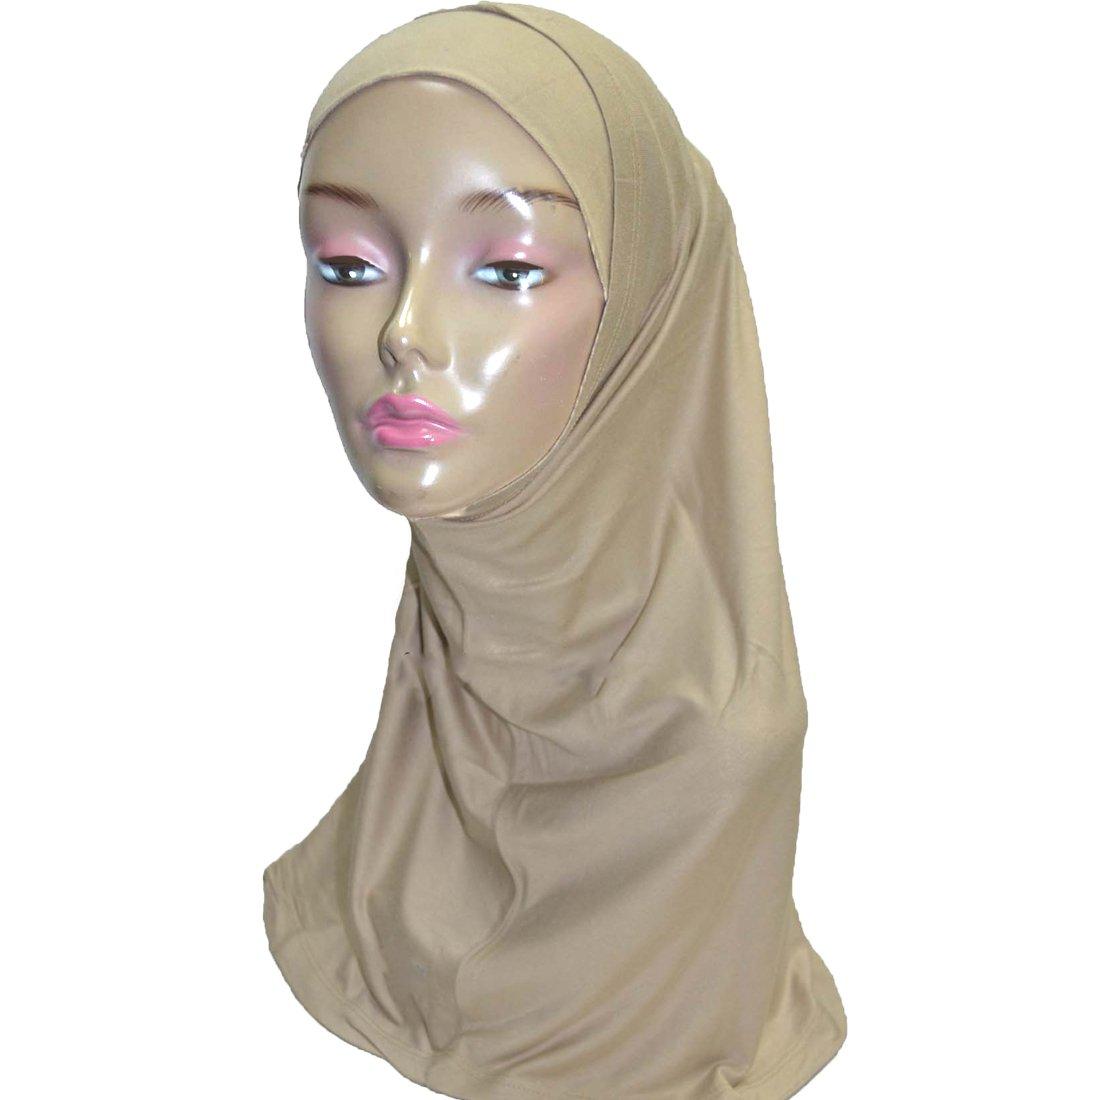 Hayaa Clothing 2 Piece Amira Hijab Light Weight Viscose (Beige)